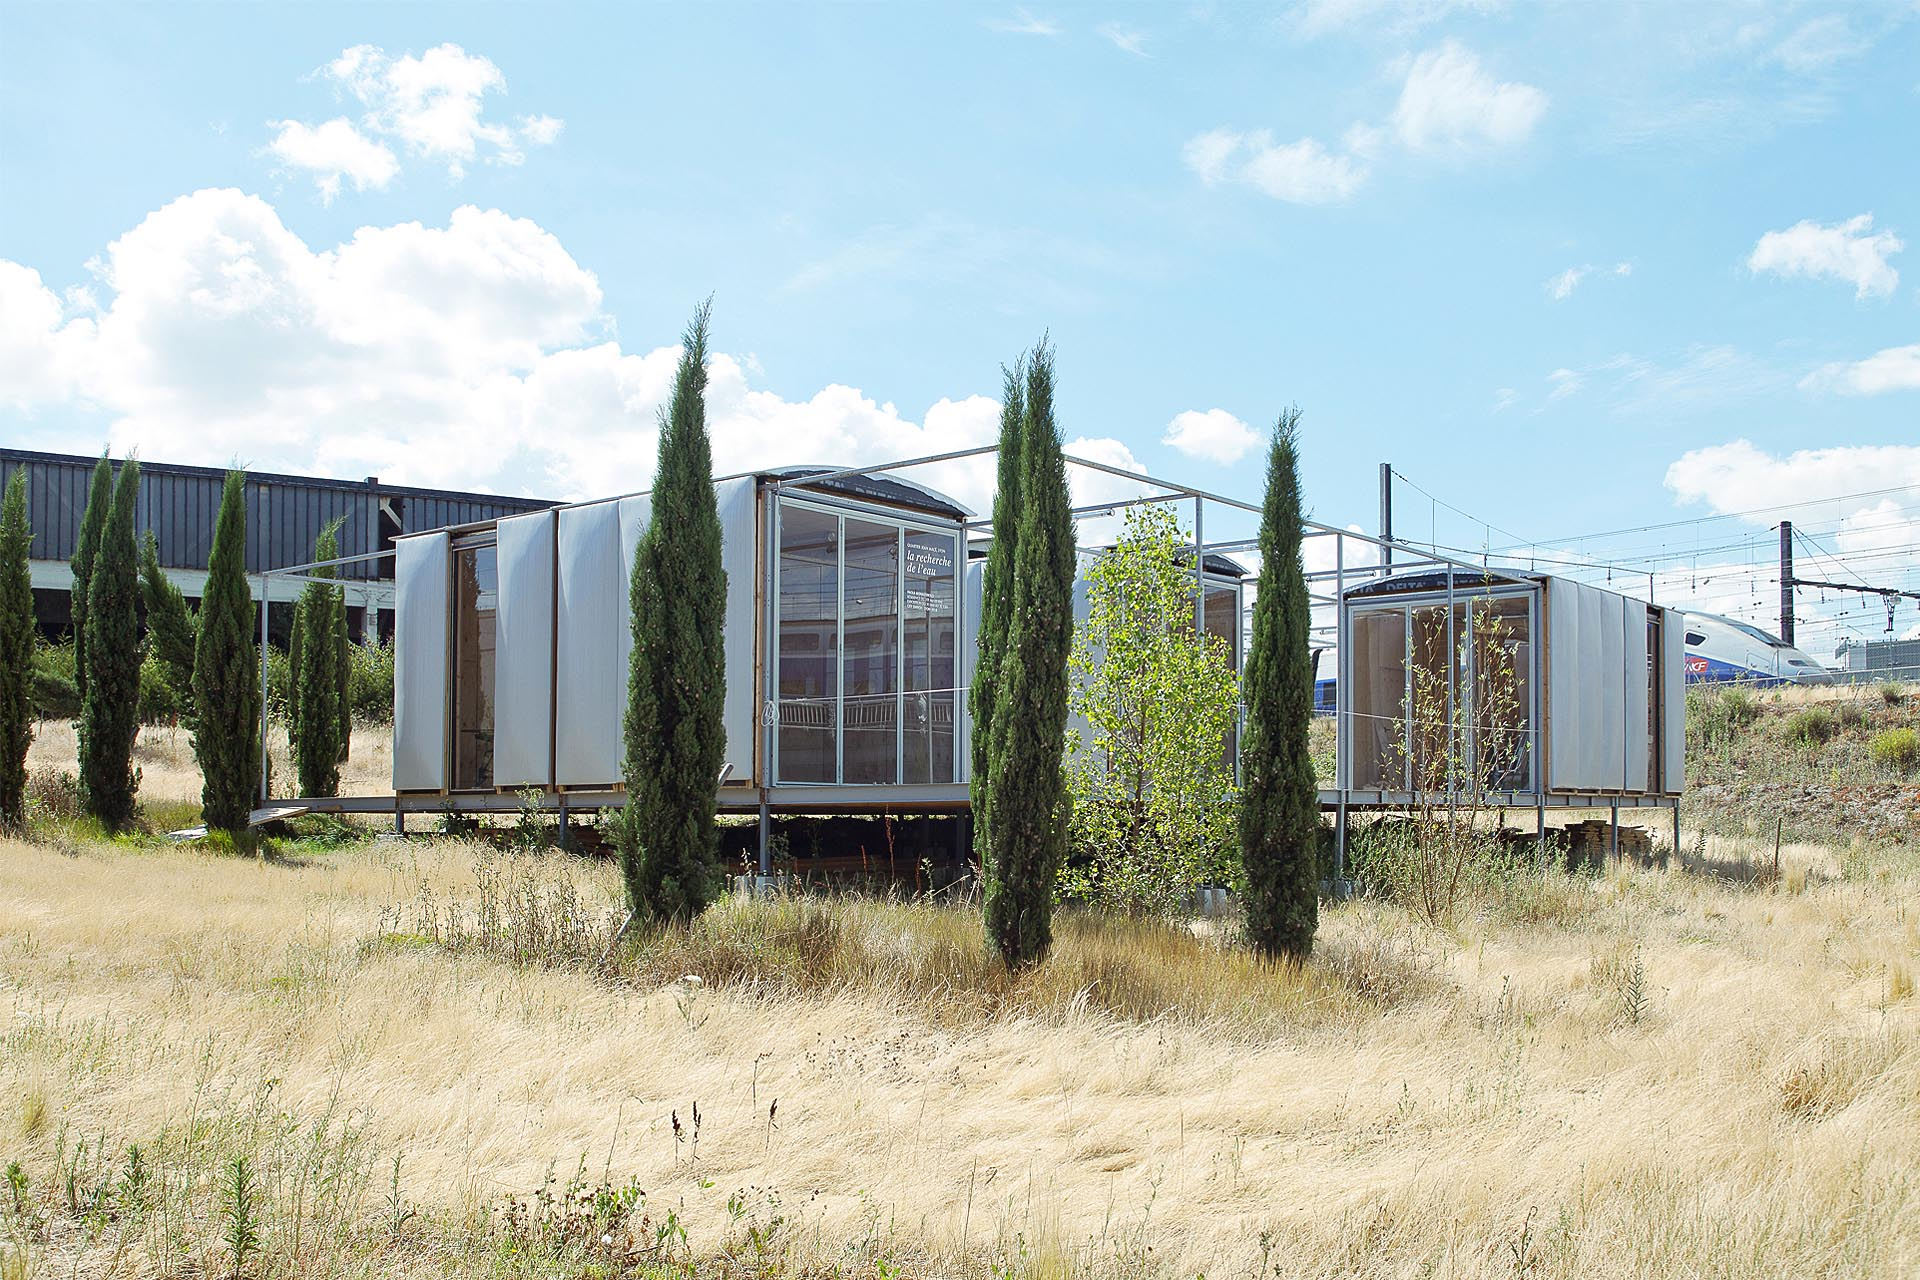 factatory philippe rizzotti architecte. Black Bedroom Furniture Sets. Home Design Ideas